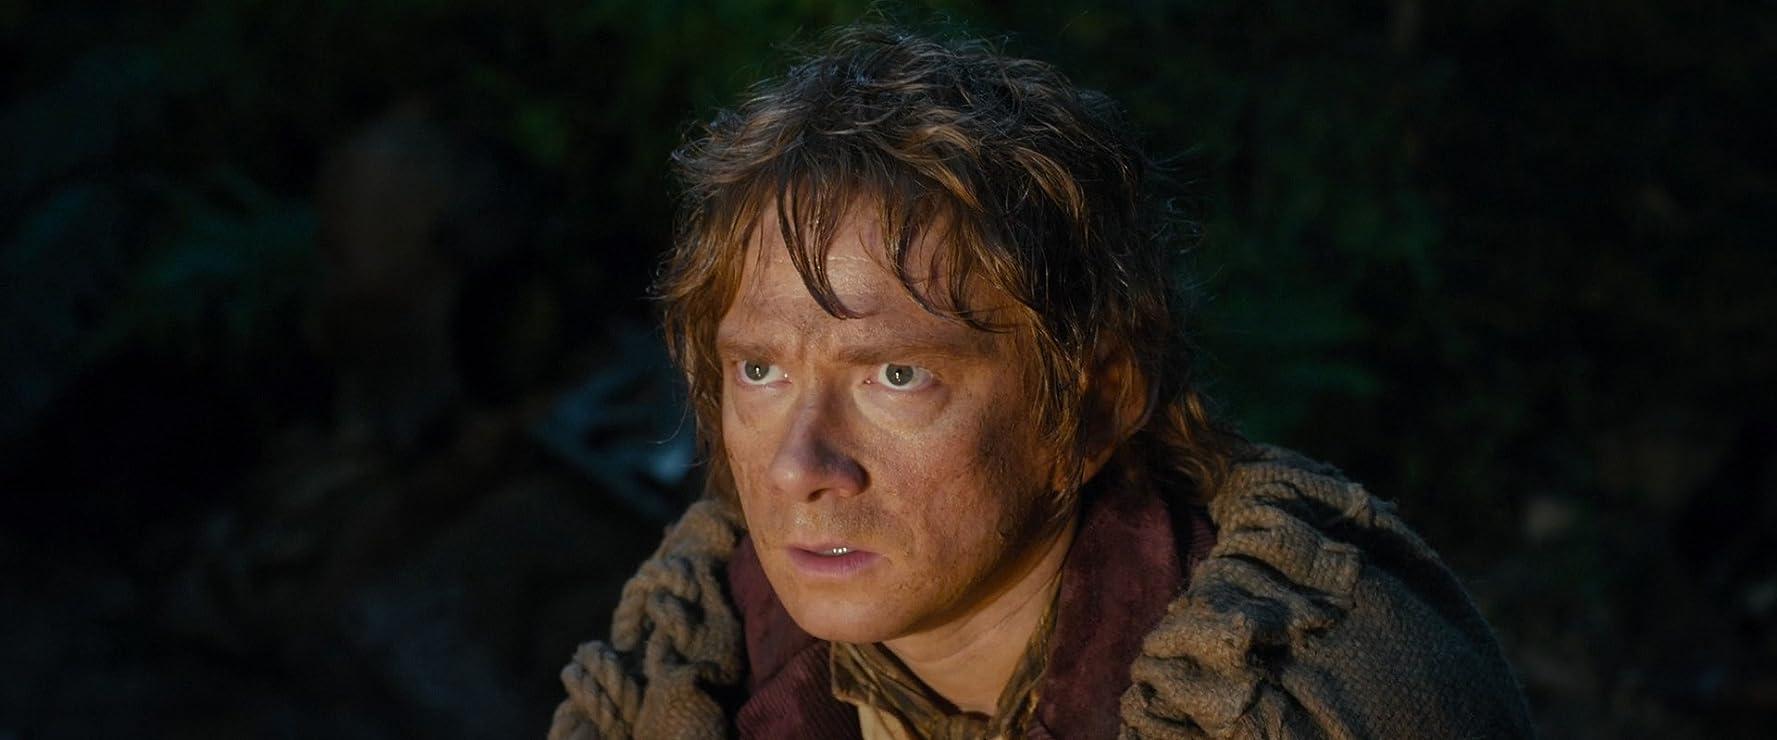 Hobbitul O calatorie neasteptata (2012) Online Subtitrat